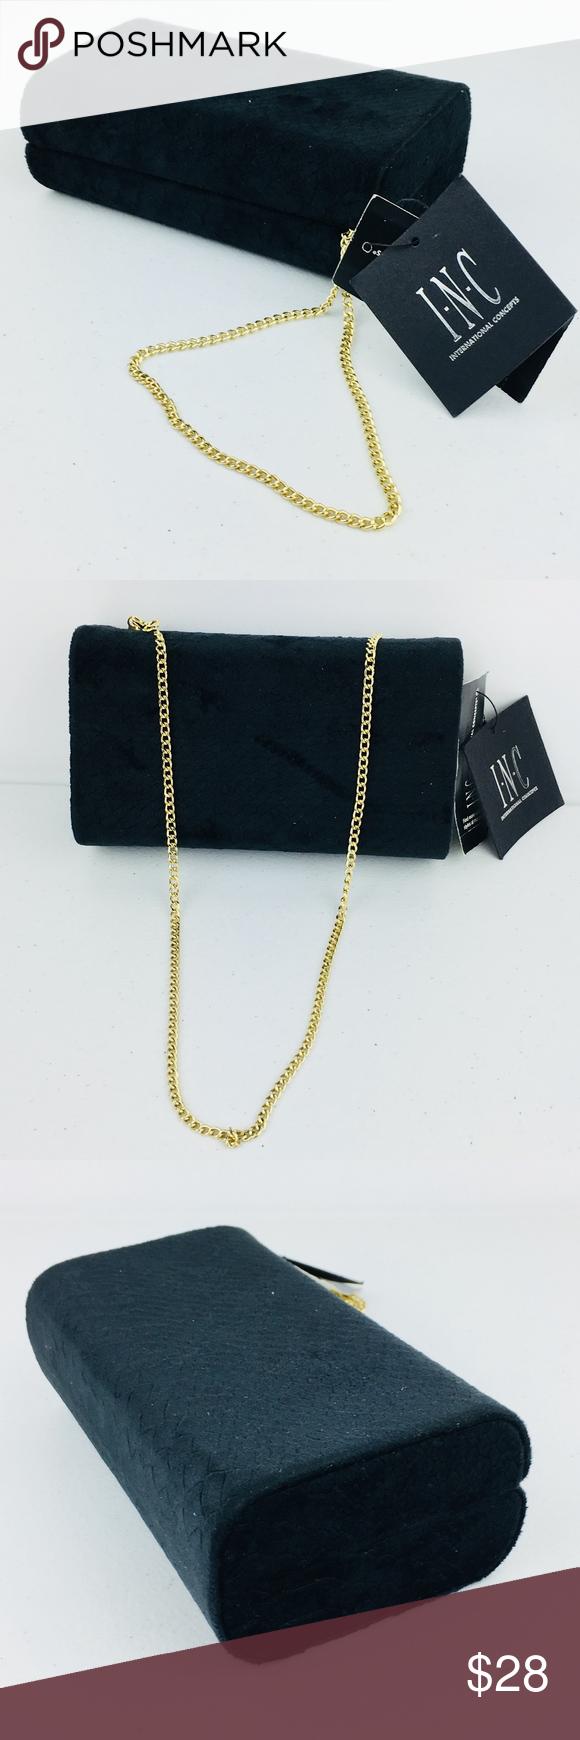 new black velvet clutch handbag gold chain nwt in 2018 my posh rh pinterest com